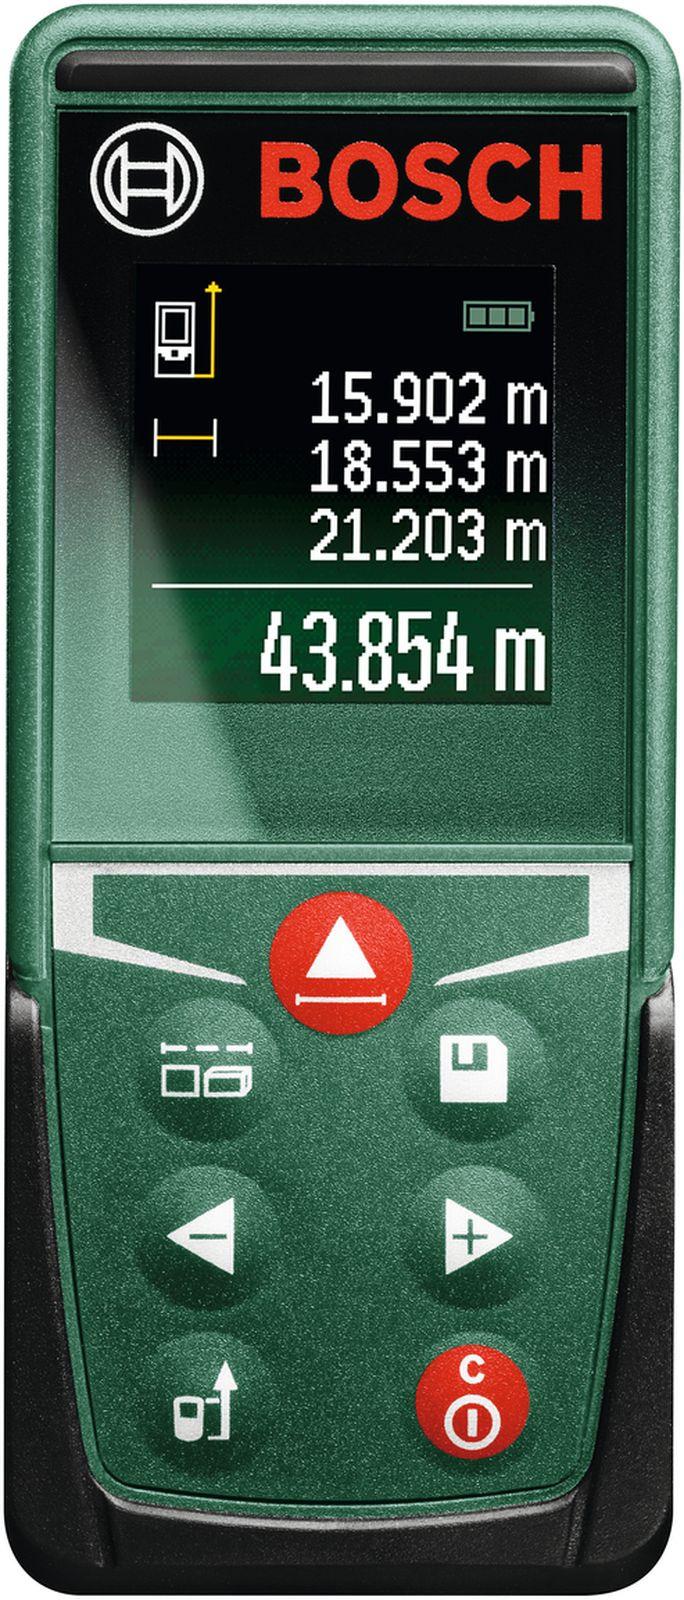 Дальномер Bosch Universal Distance 50, 0603672800